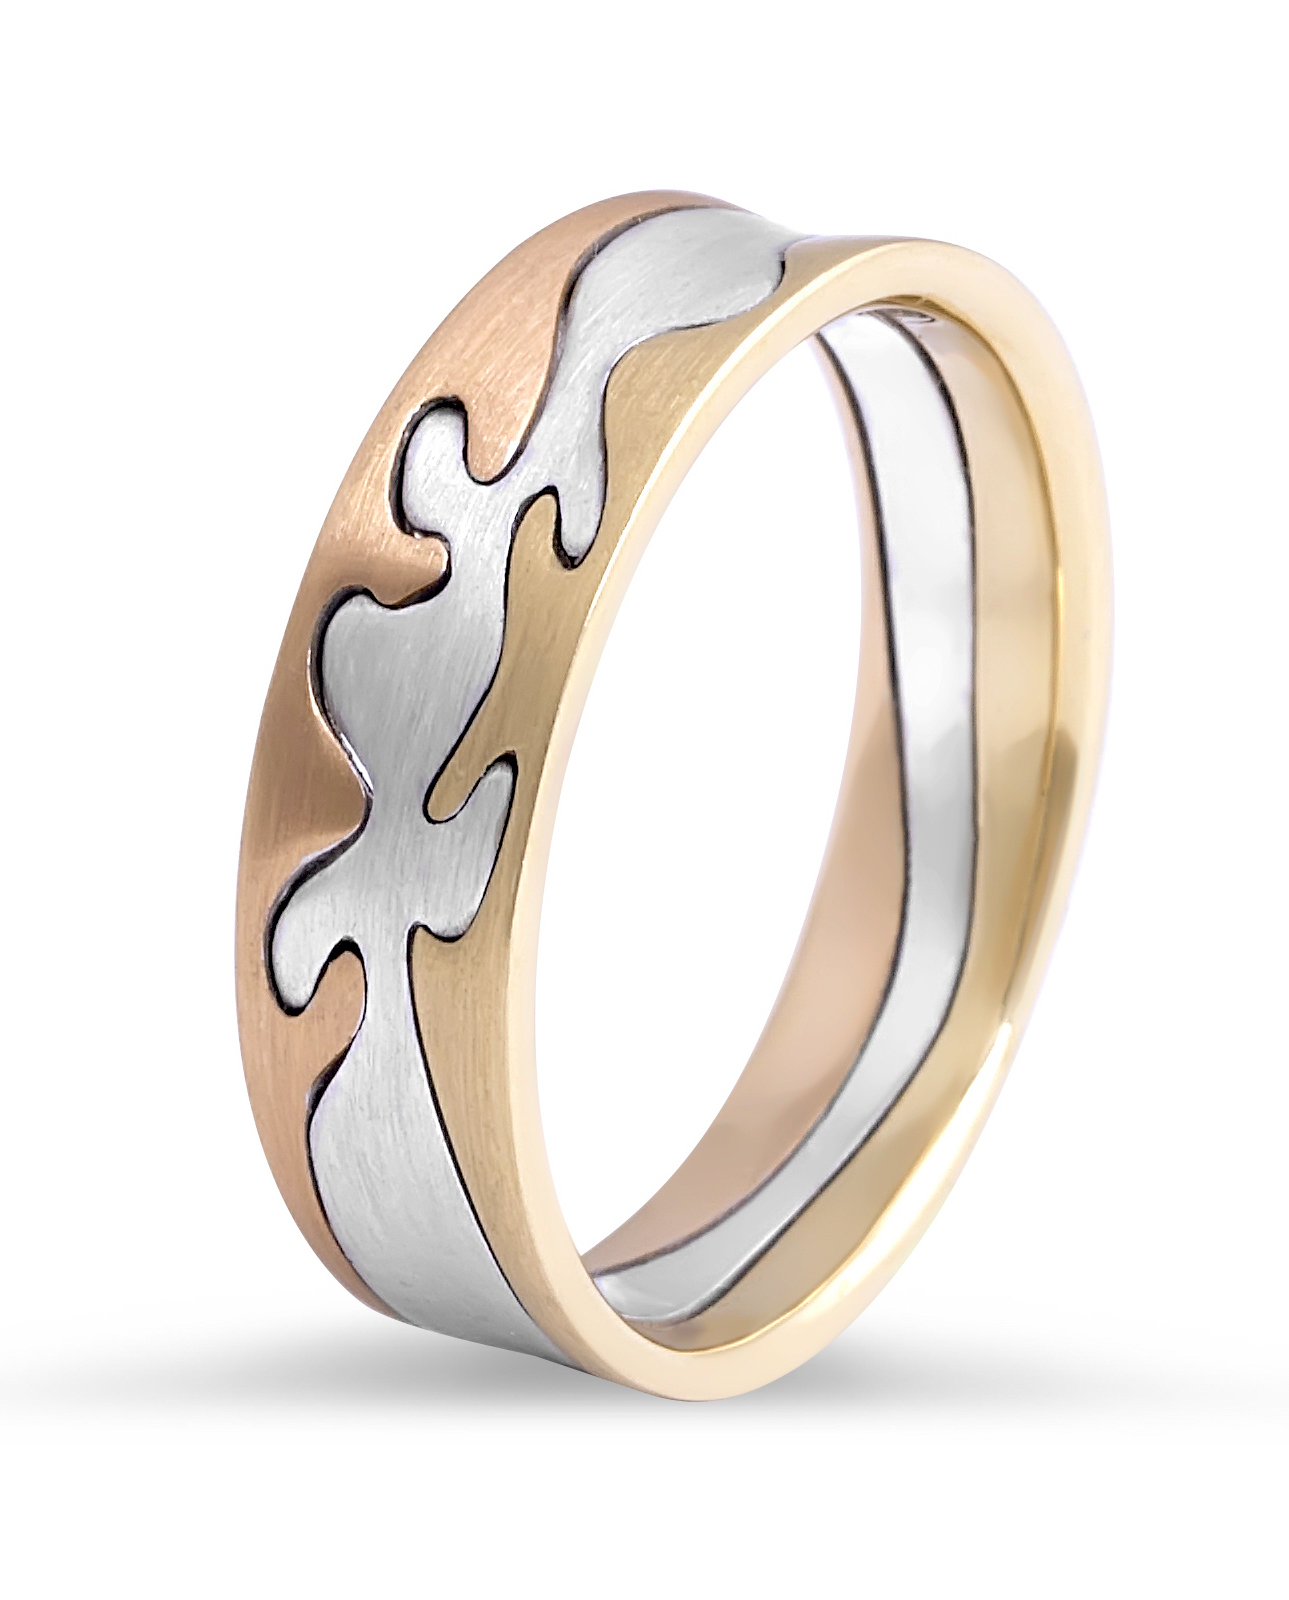 18k white and rose gold wedding rings